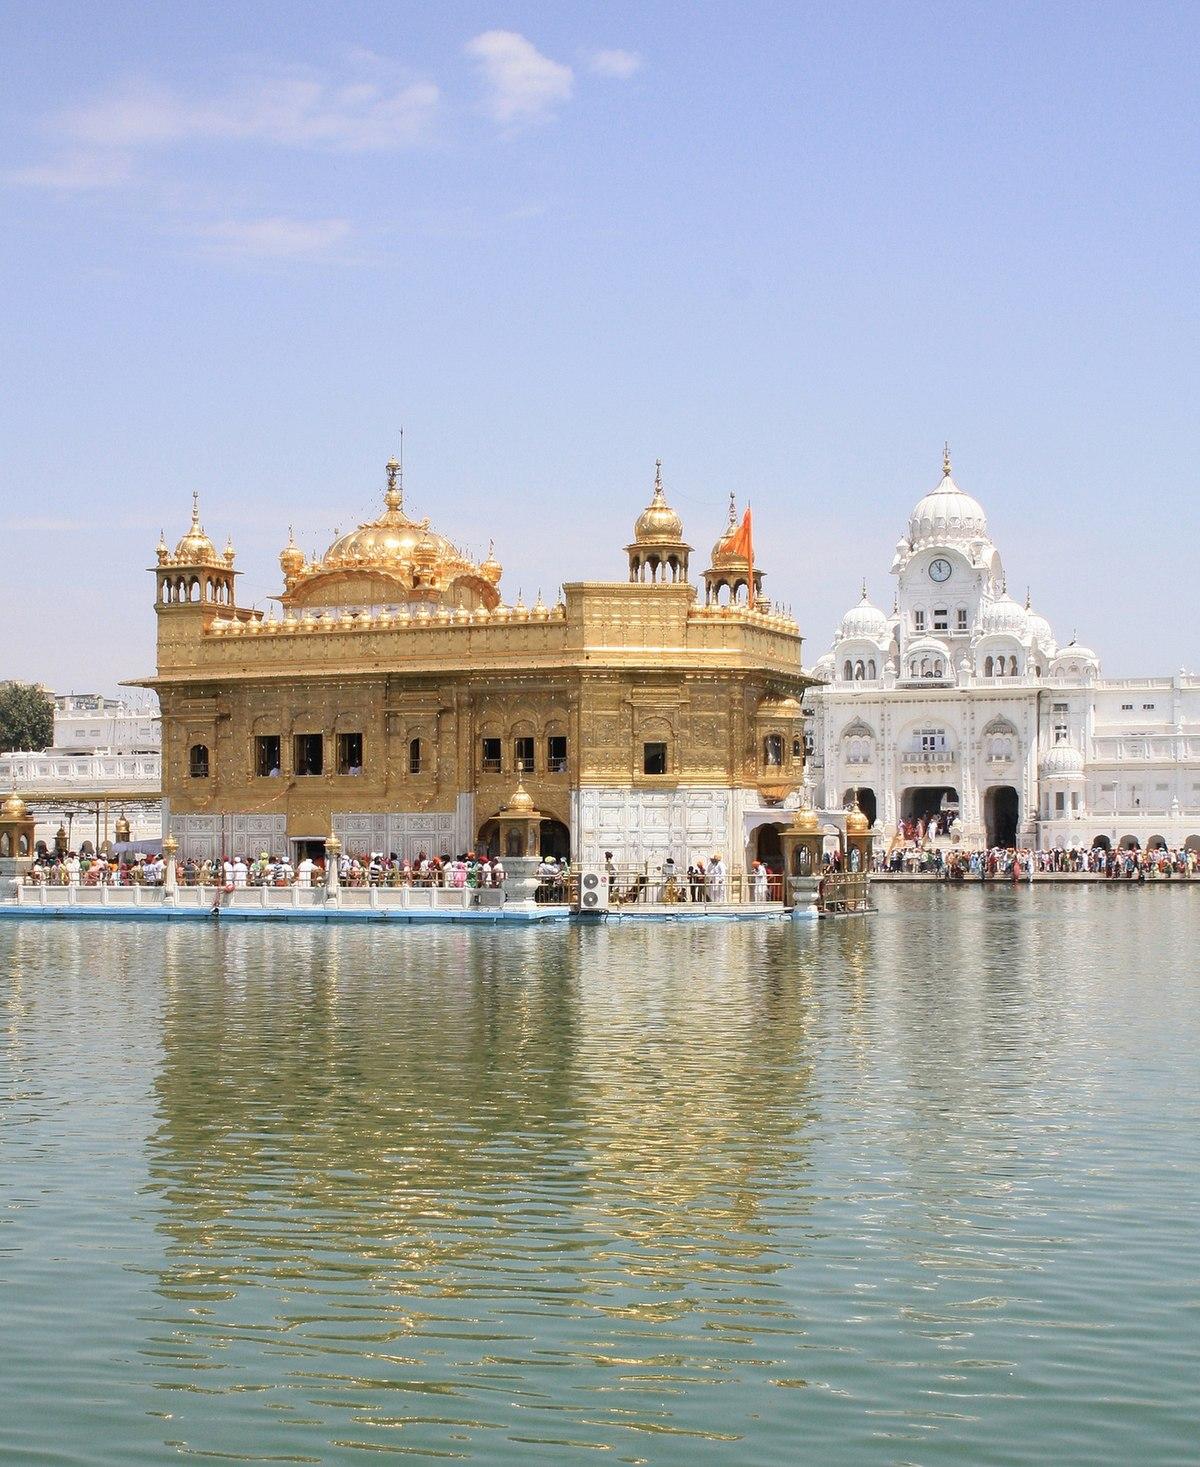 File:Golden Temple2,Amritsar By Bha.jpg